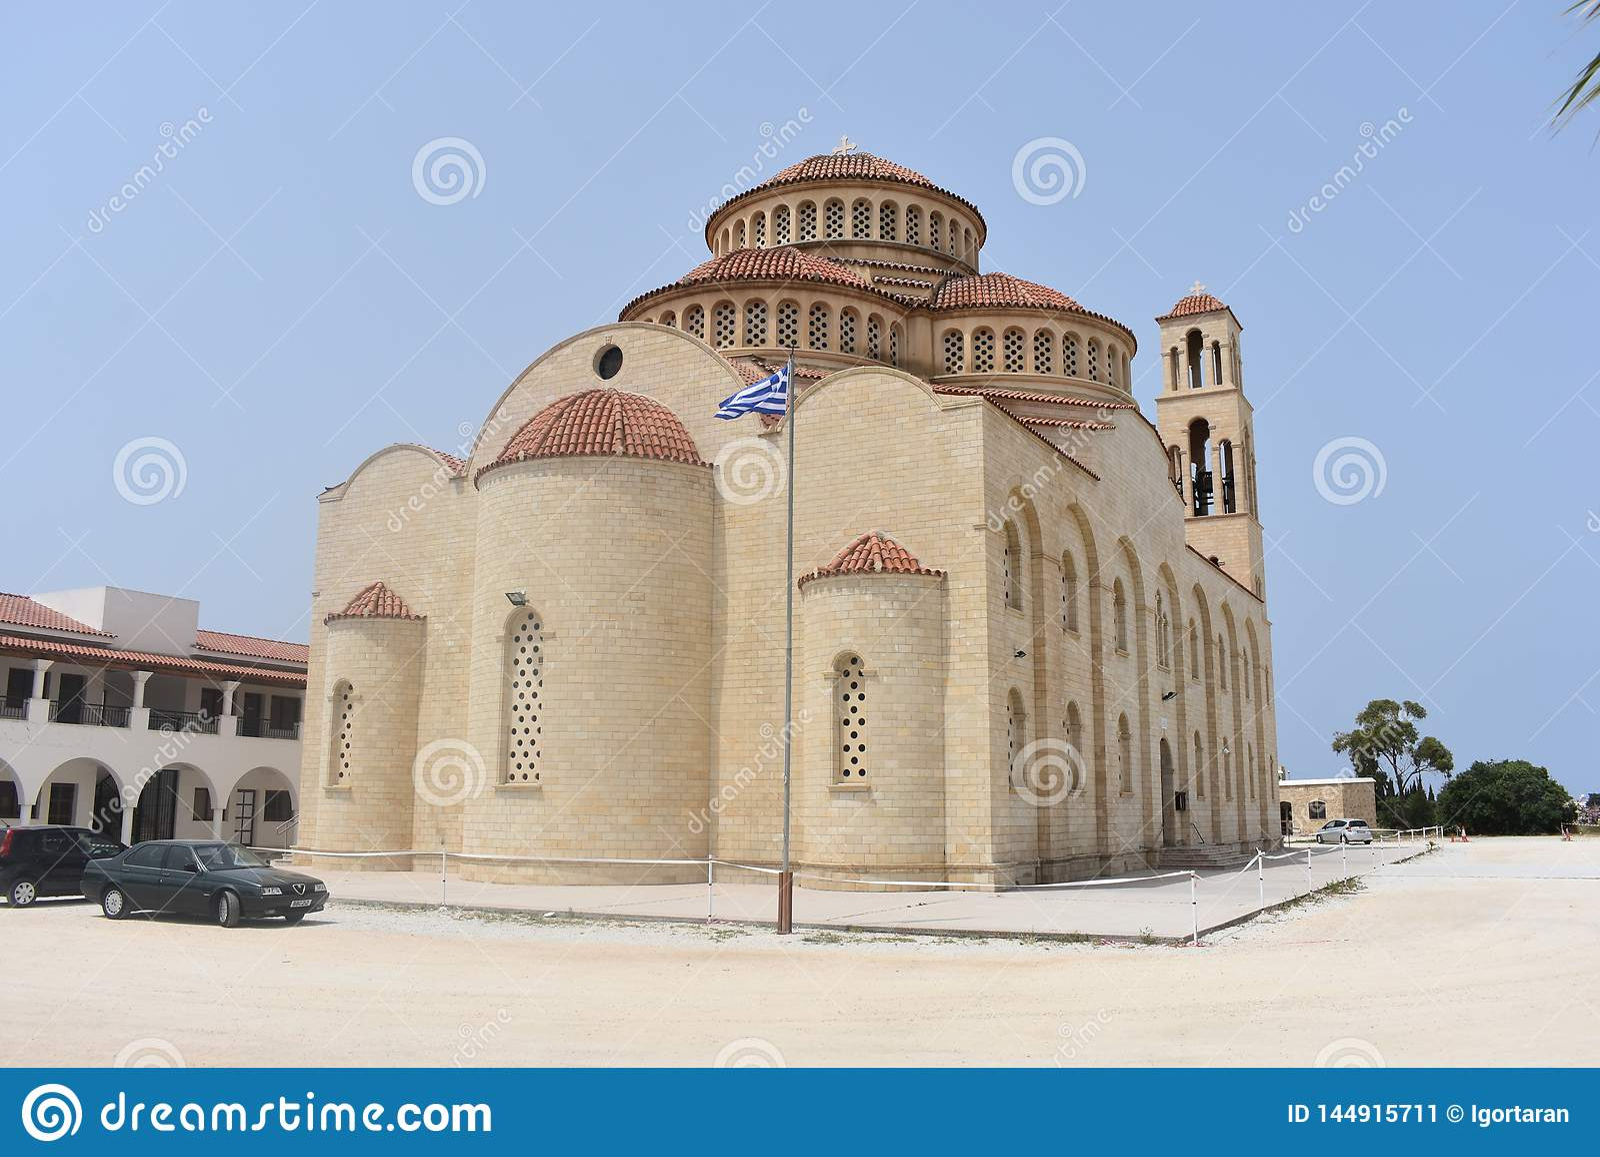 Church greek Νησί της Κύπρου